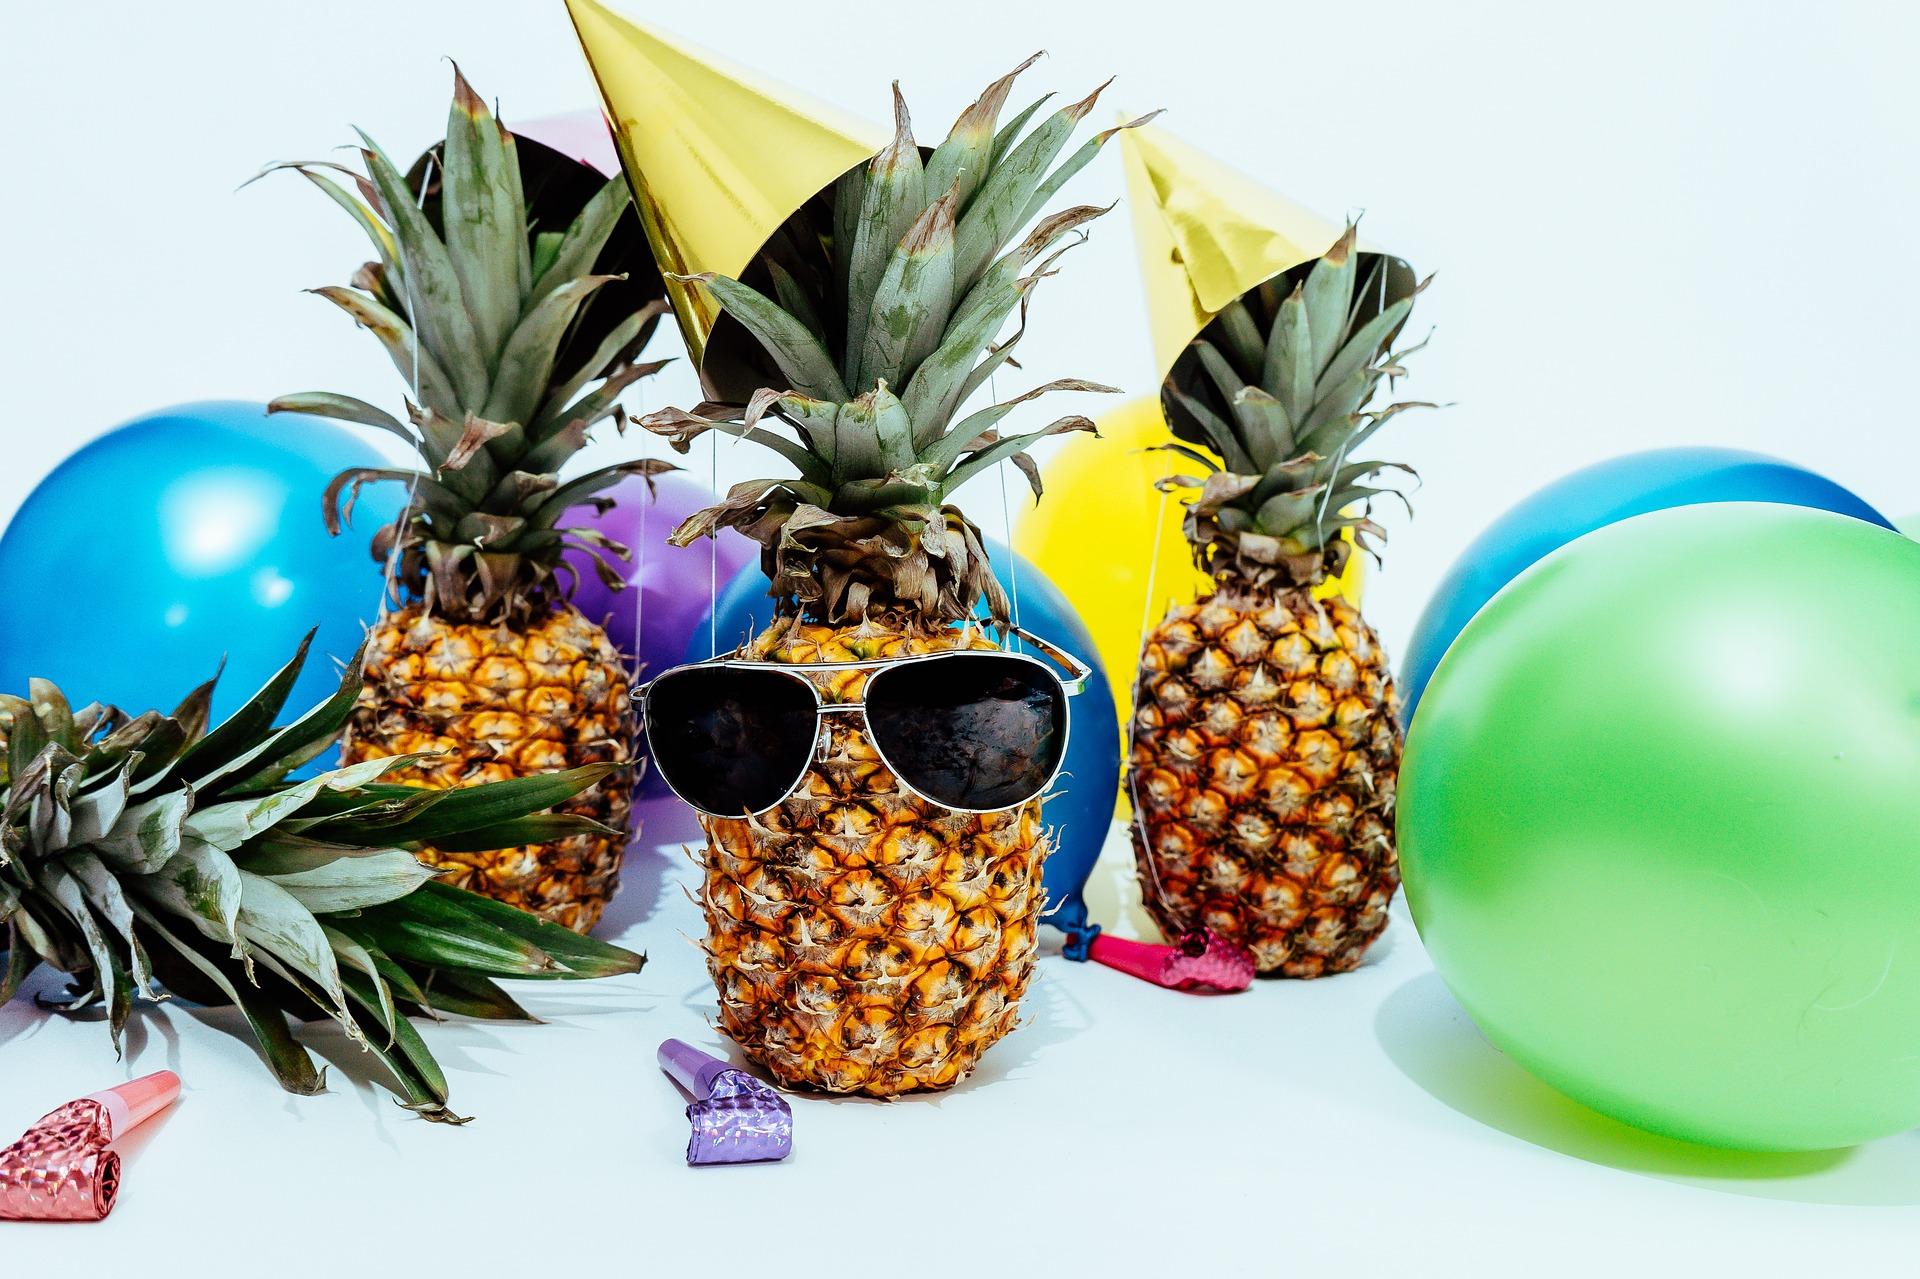 pineapple-2559343_1920